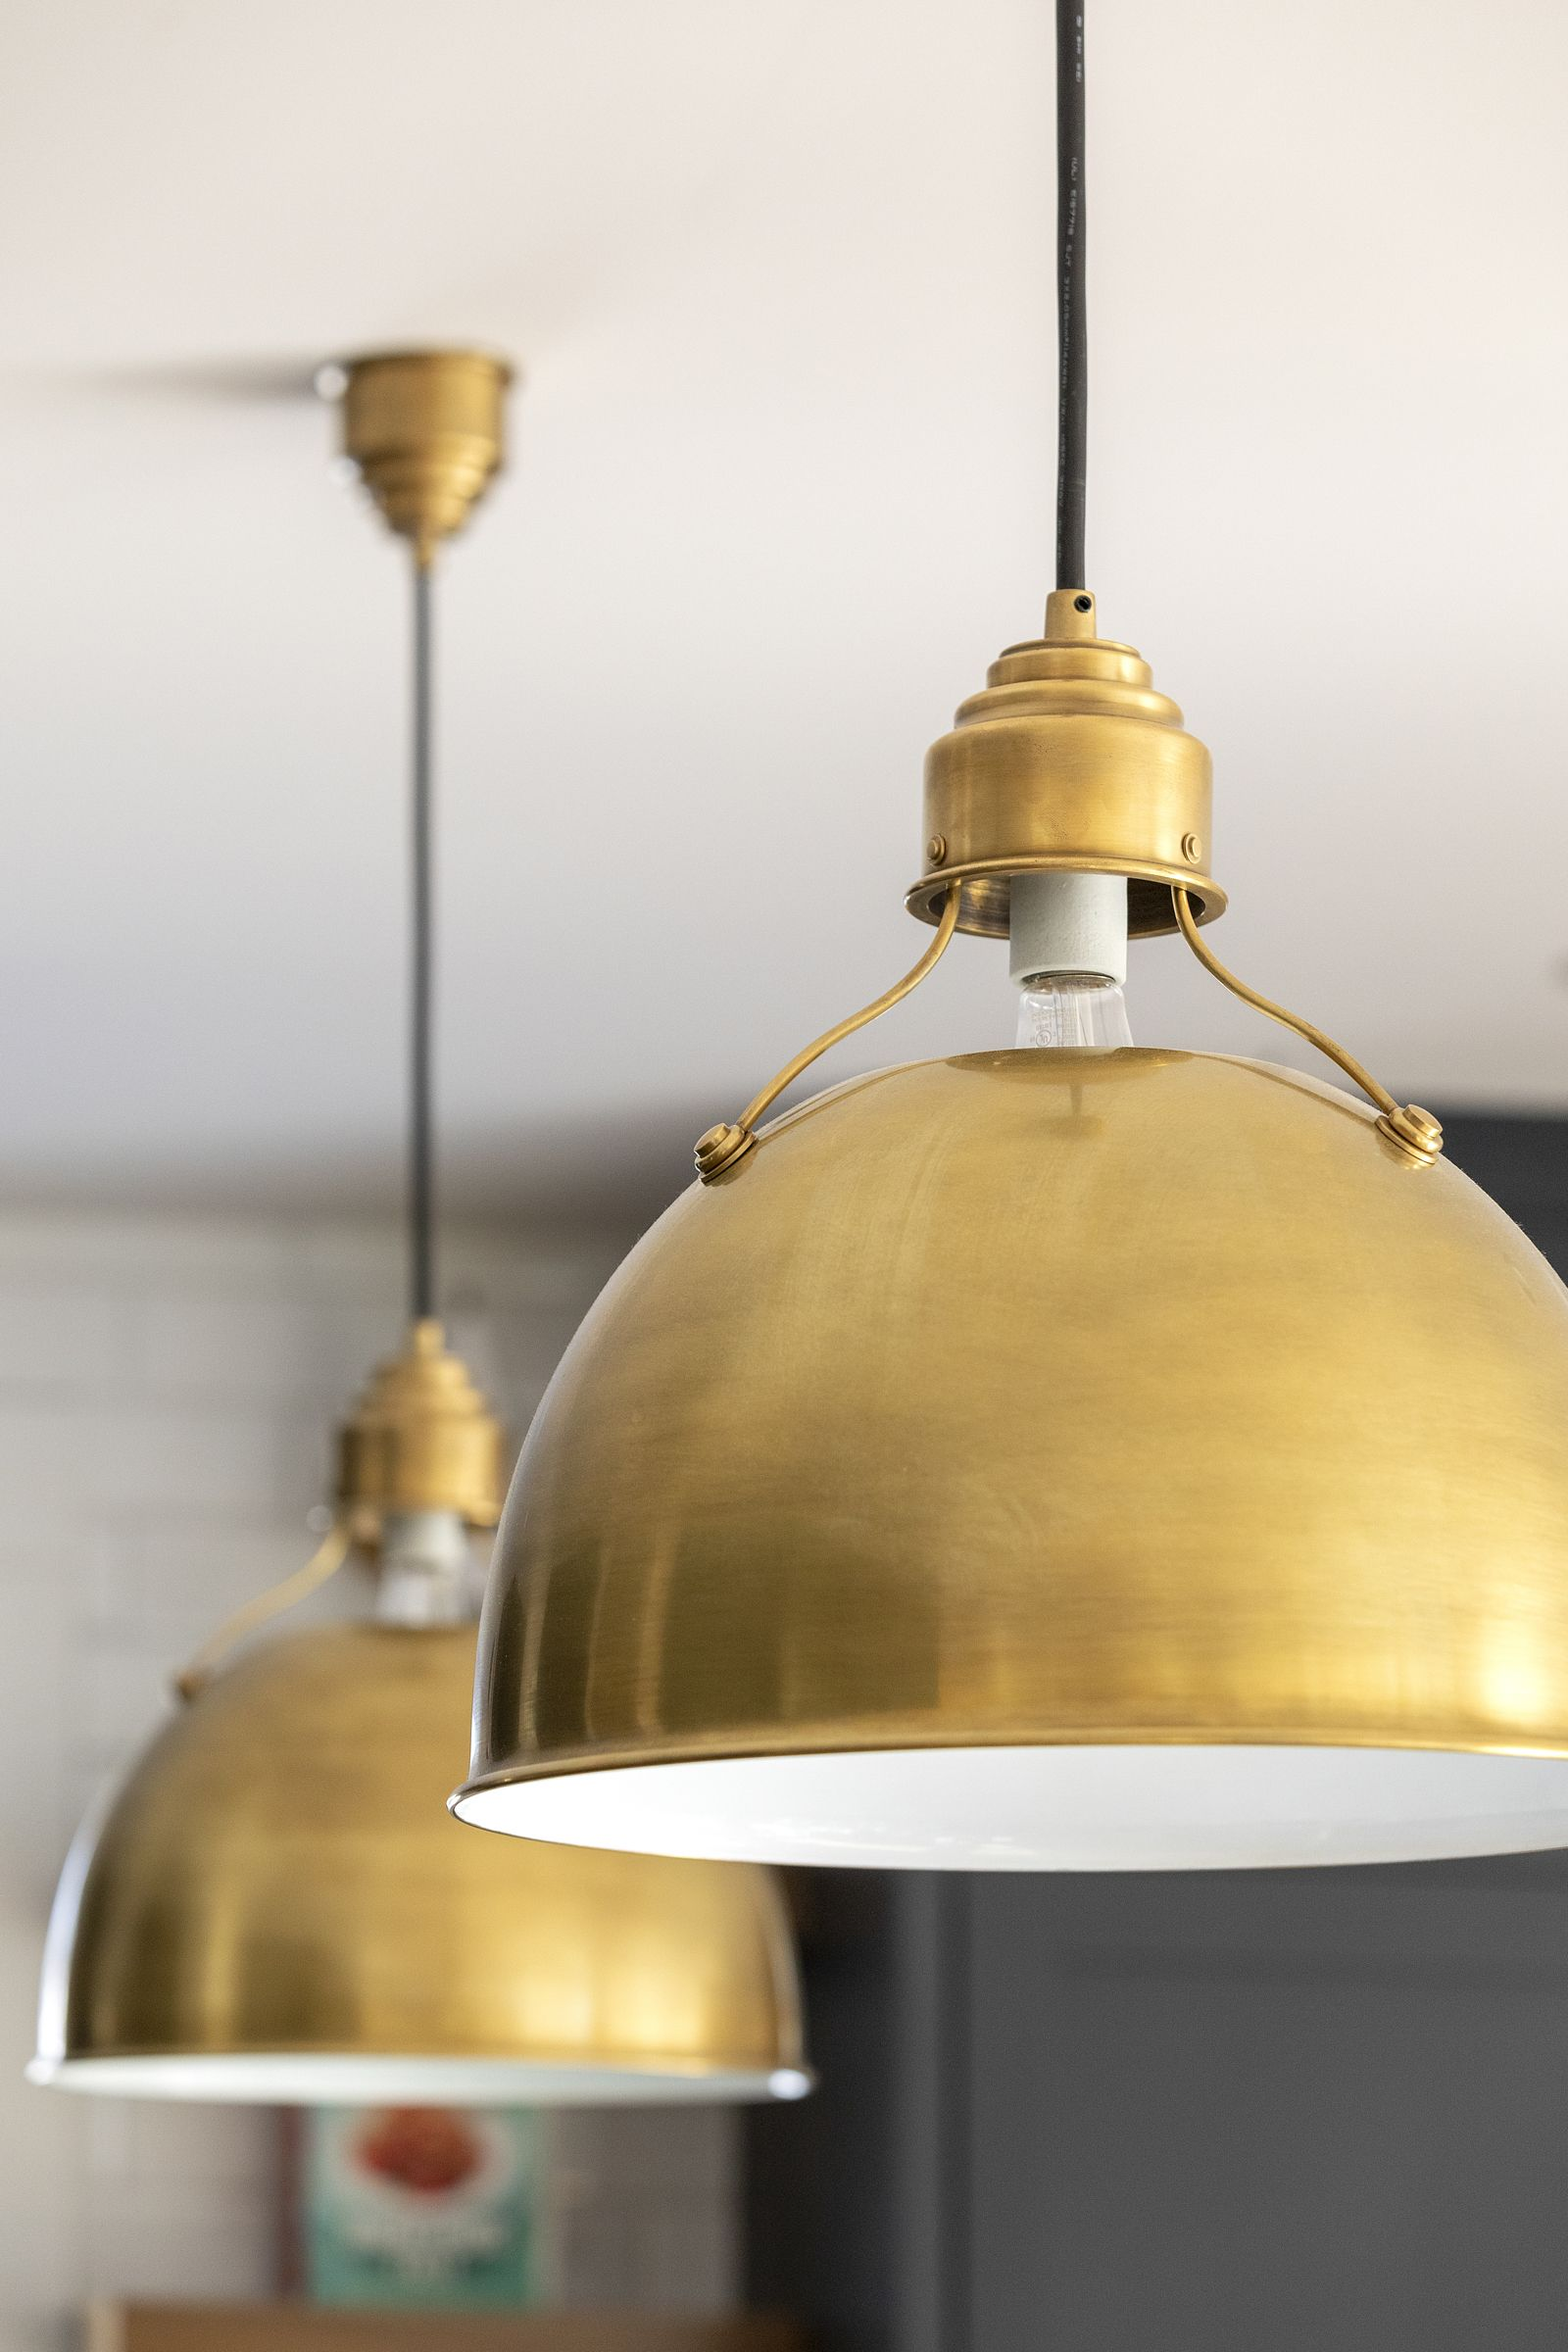 Kitchen Pendant Lights Gold Pendant Light Fixtures Kitchen Pendant Lighting Kitchen Lighting Fixtures